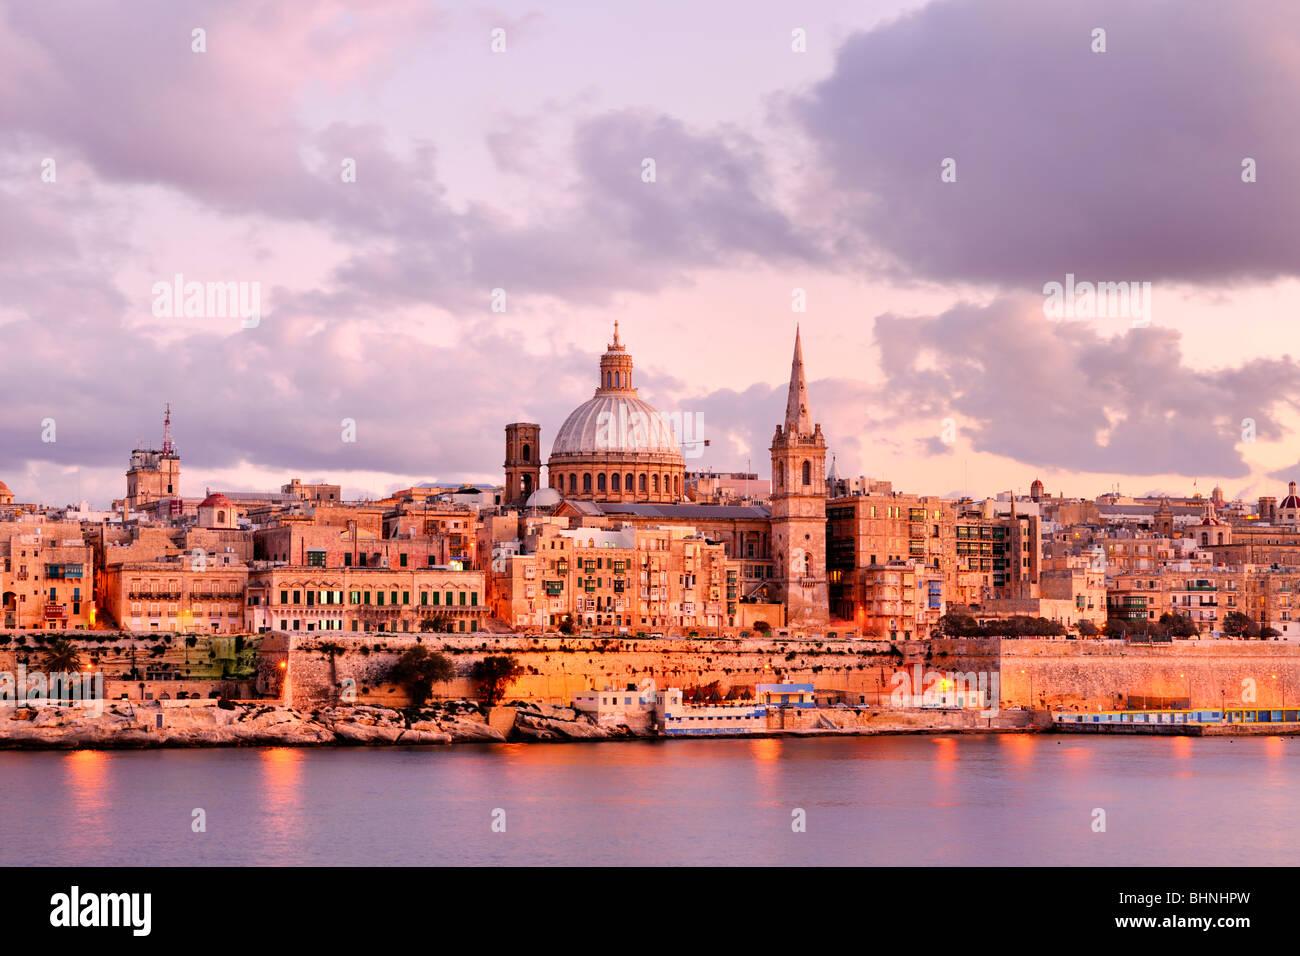 Valletta Carmelite Church Dome spire - Stock Image